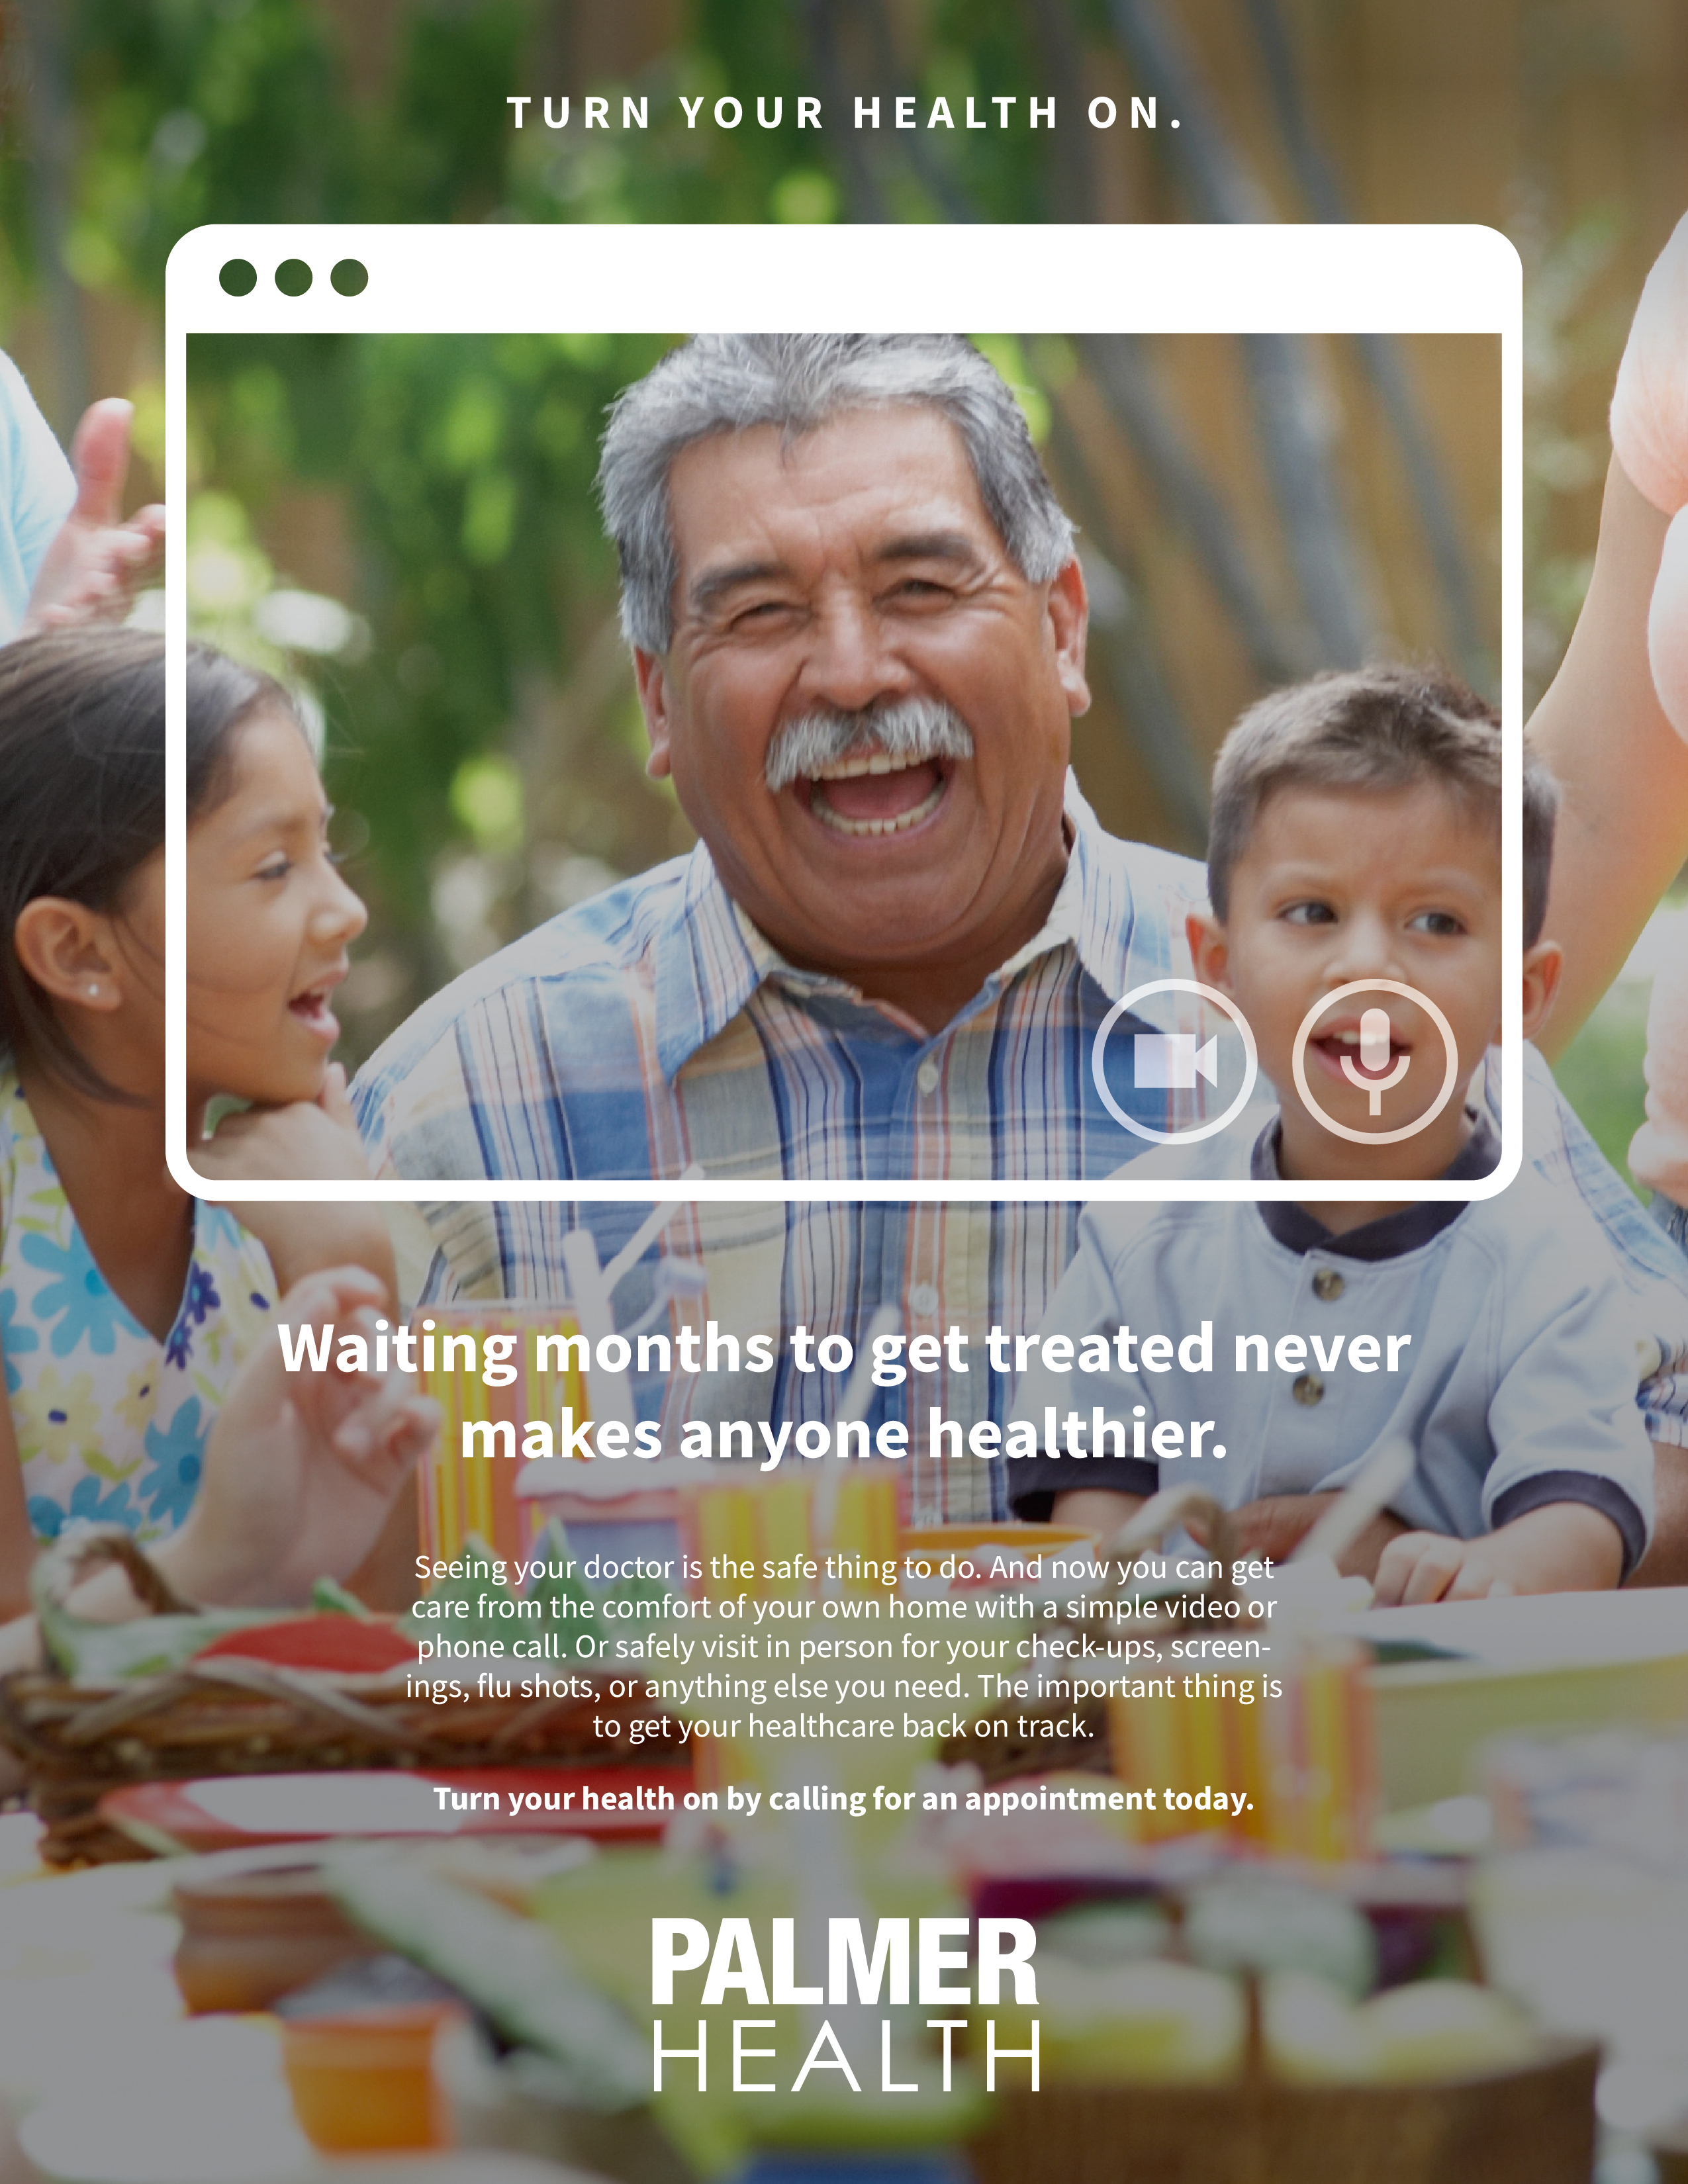 36152 Palmer health as dev for website-turn your health on-v4-aug 20-02